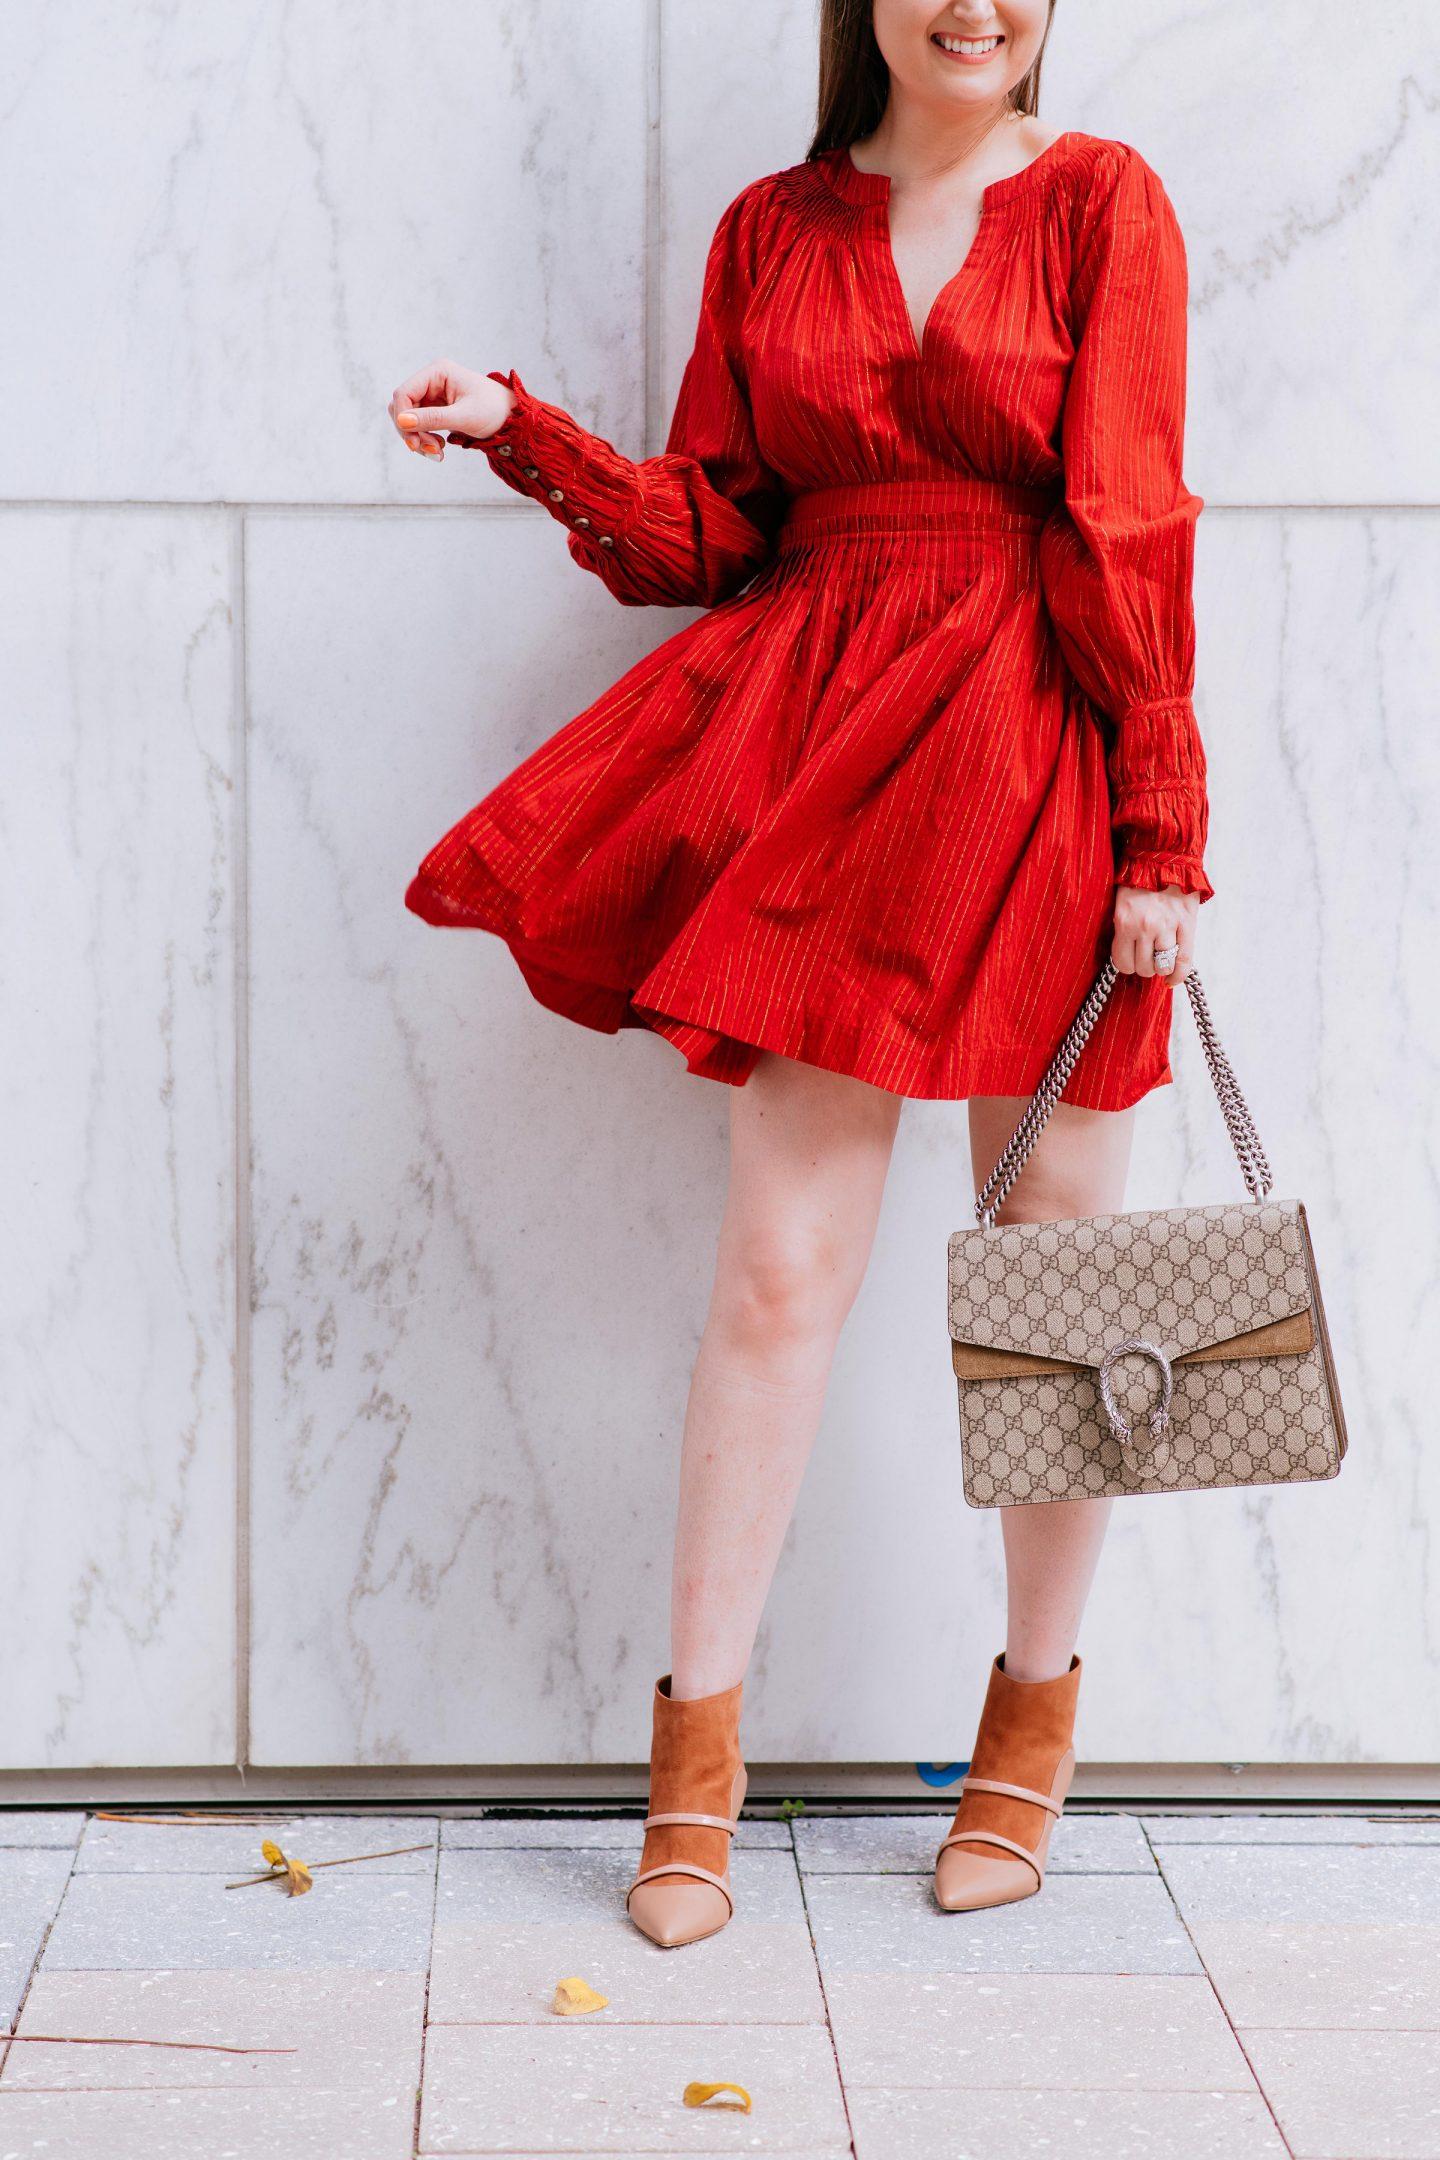 Ulla johnson dress, ulla johnson, red dress, malone souliers booties, gucci dionysus medium, gucci dionysus handbag, ulla johnson rory dress